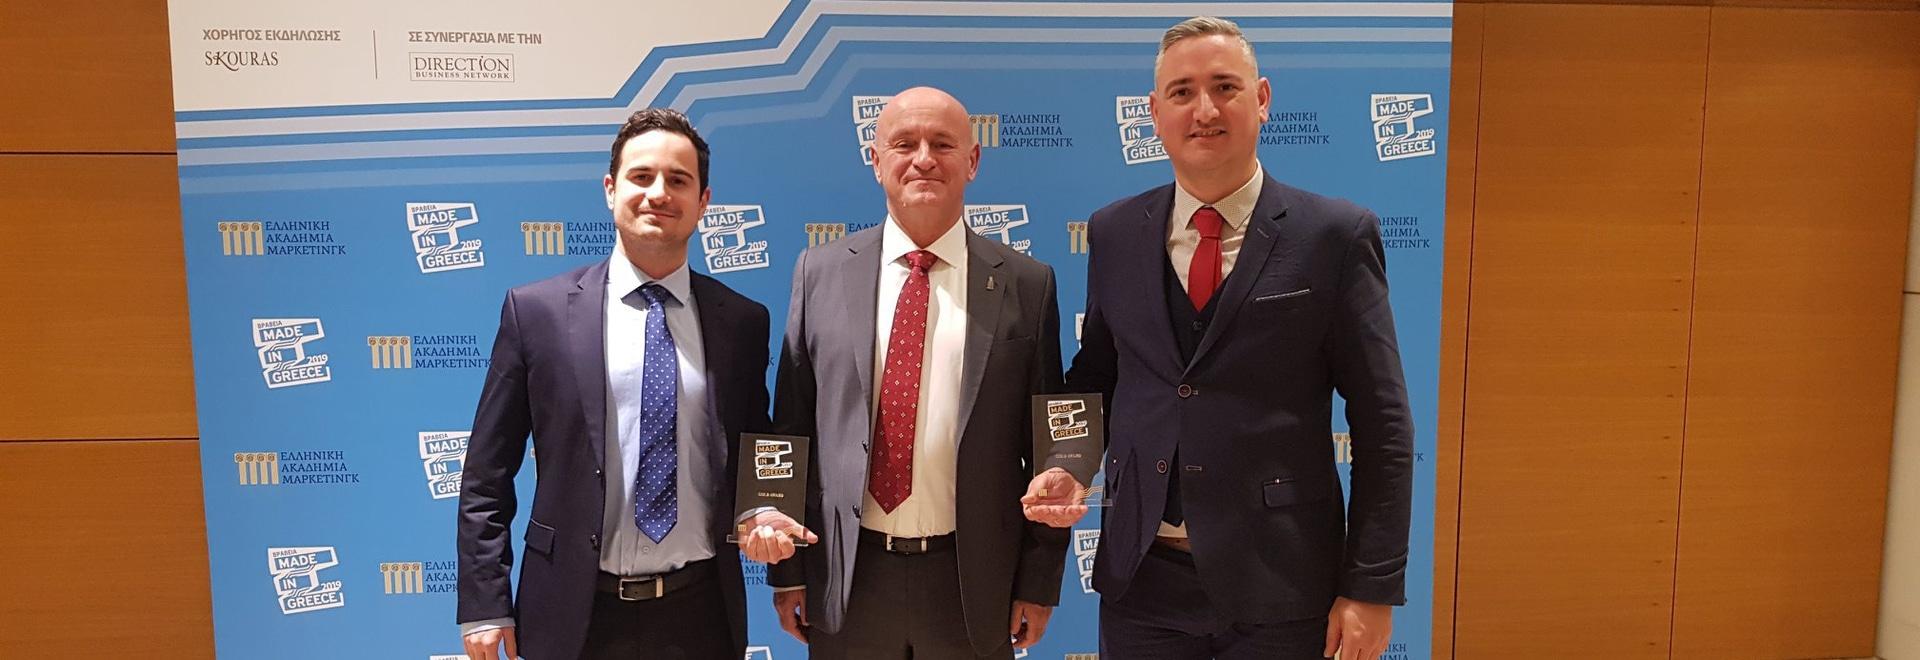 LALIZAS riceve due premi Gold dalla Greek Marketing Academy